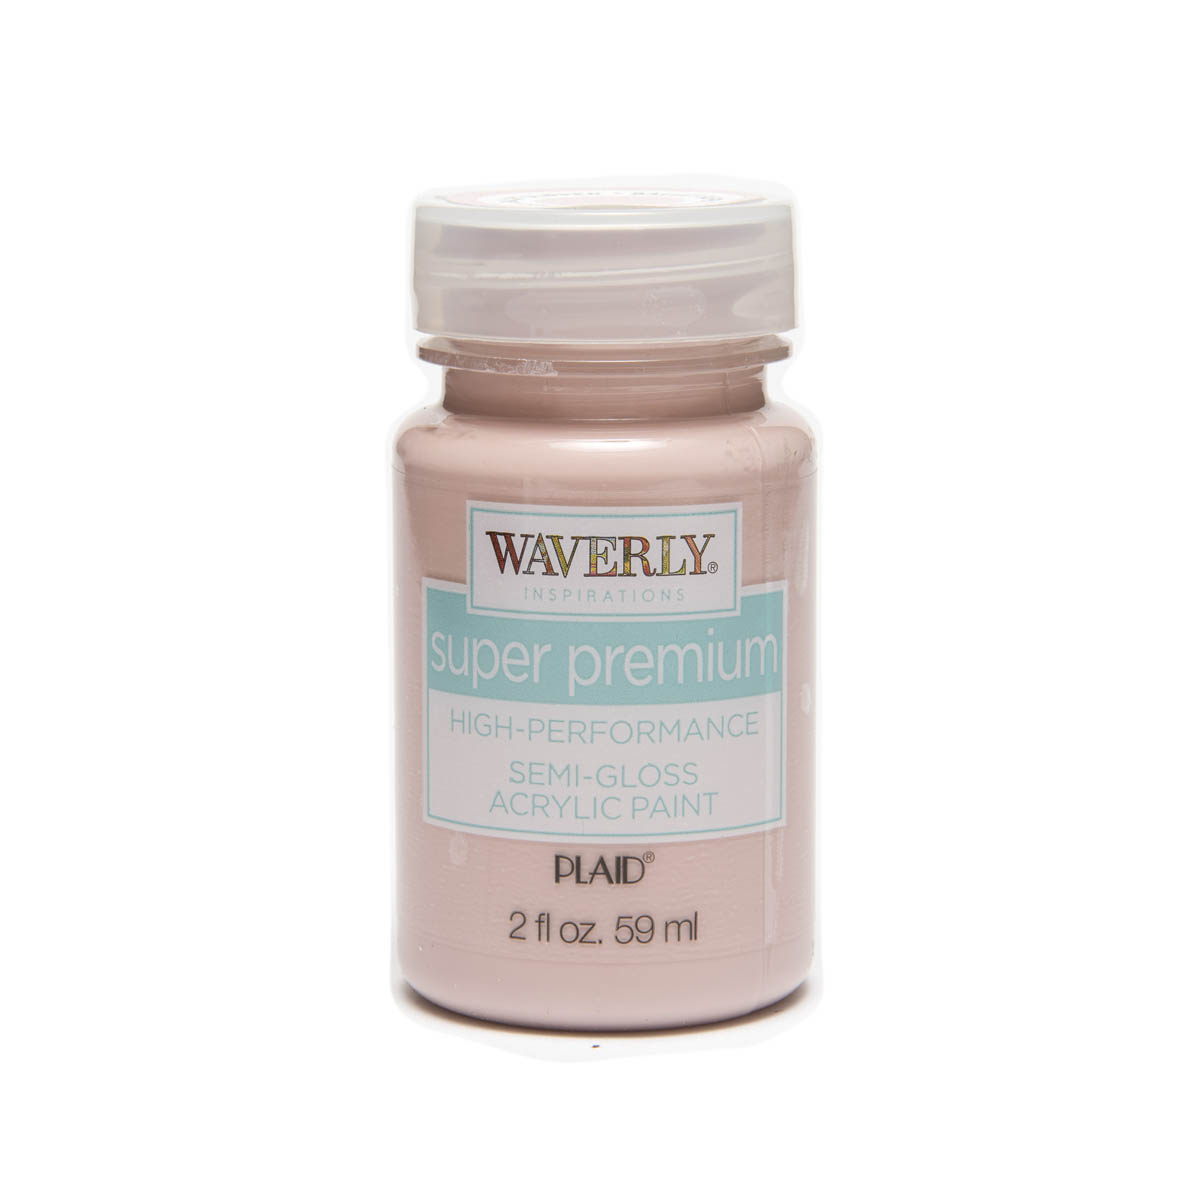 Waverly ® Inspirations Super Premium Semi-Gloss Acrylic Paint - Ballet Slipper, 2 oz.